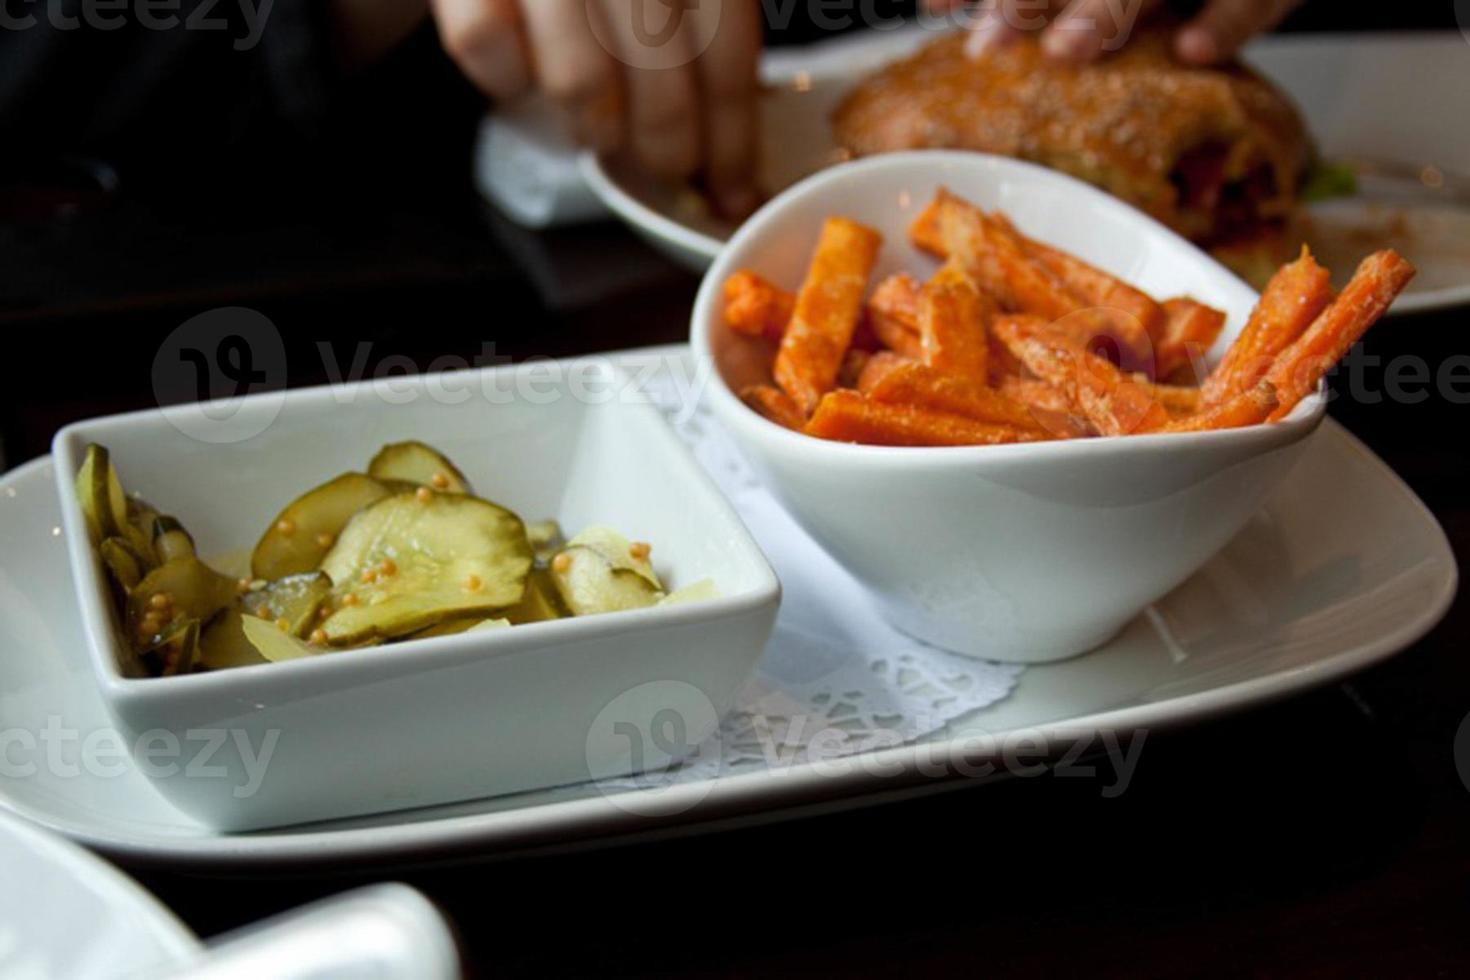 patatine sottaceto e patatine dolci foto